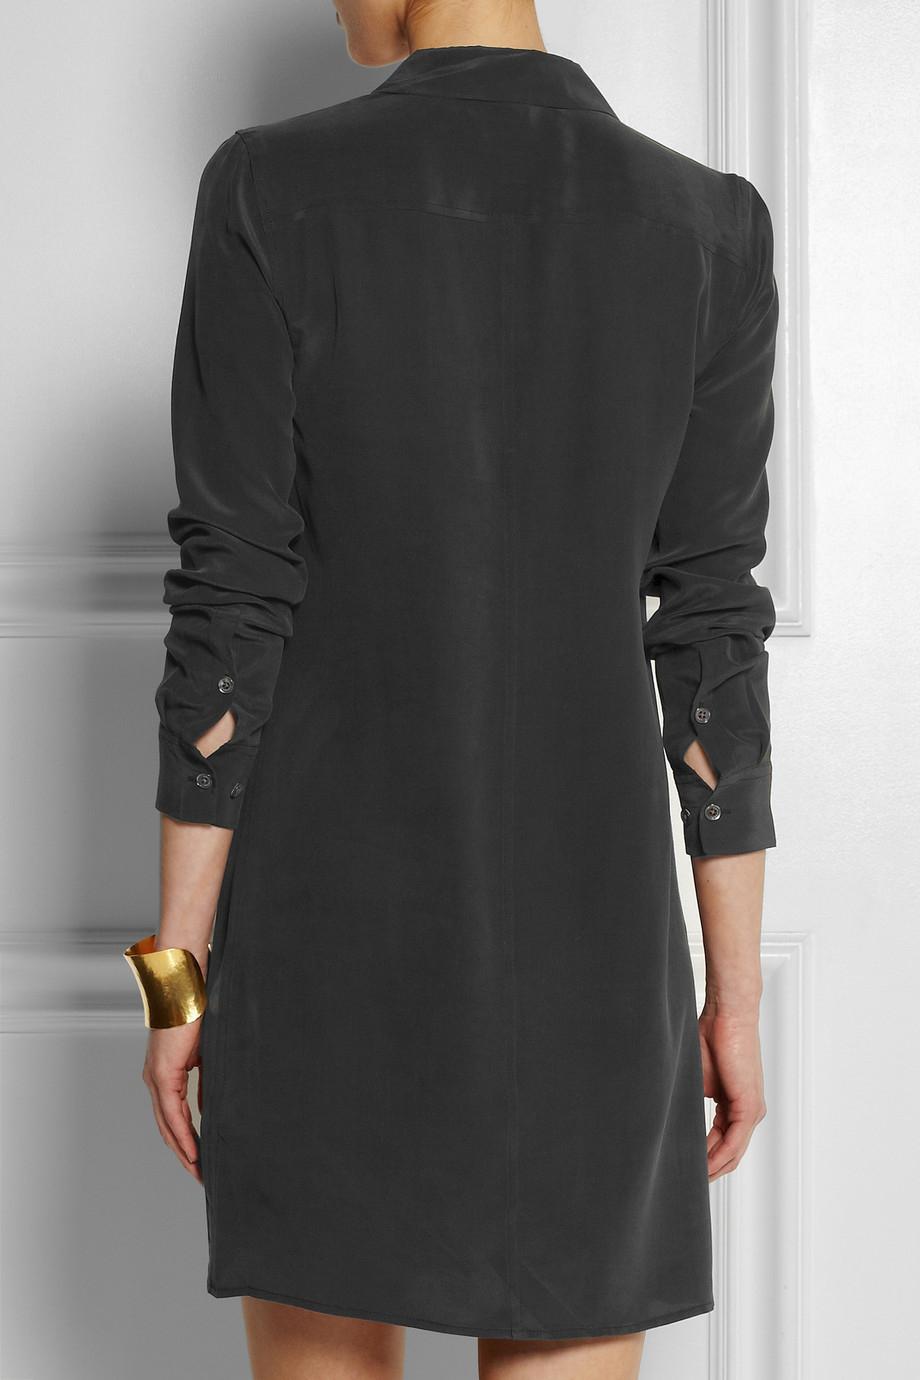 Equipment lucida washed silk shirt dress in black lyst for Equipment black silk shirt